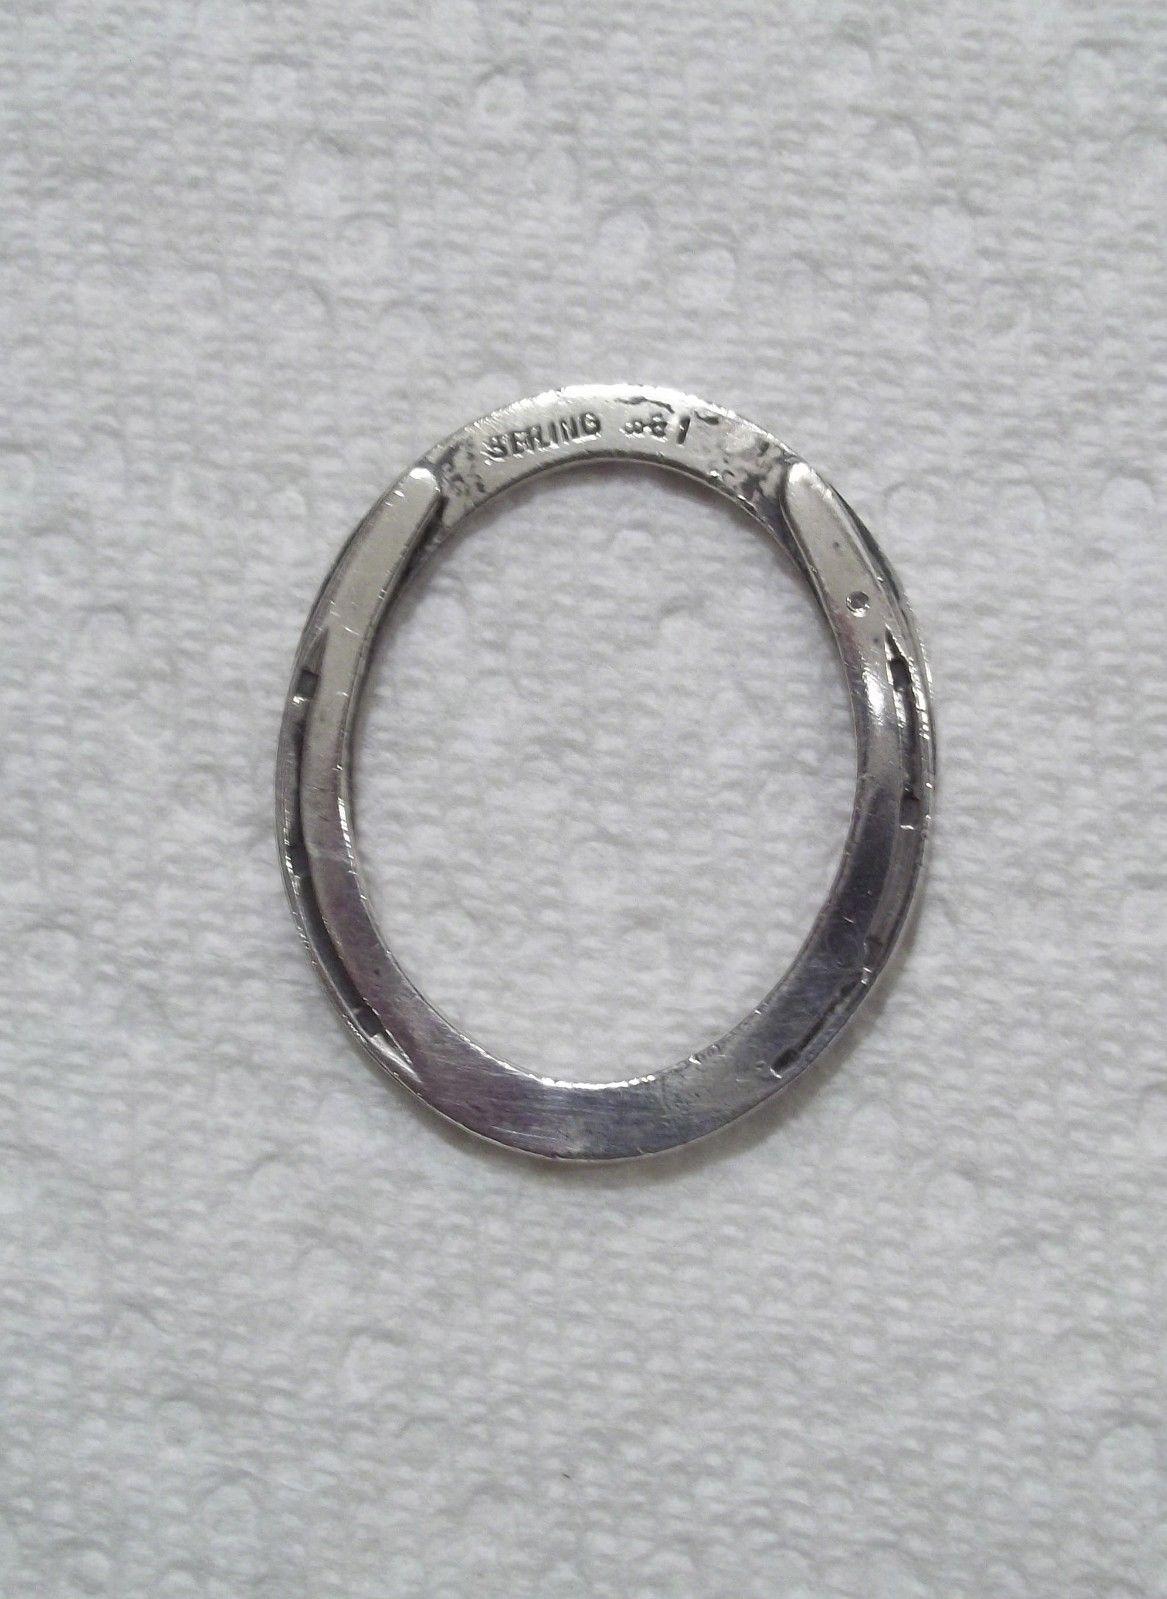 Vintage Antique Sterling Silver Horseshoe Key Ring A.J